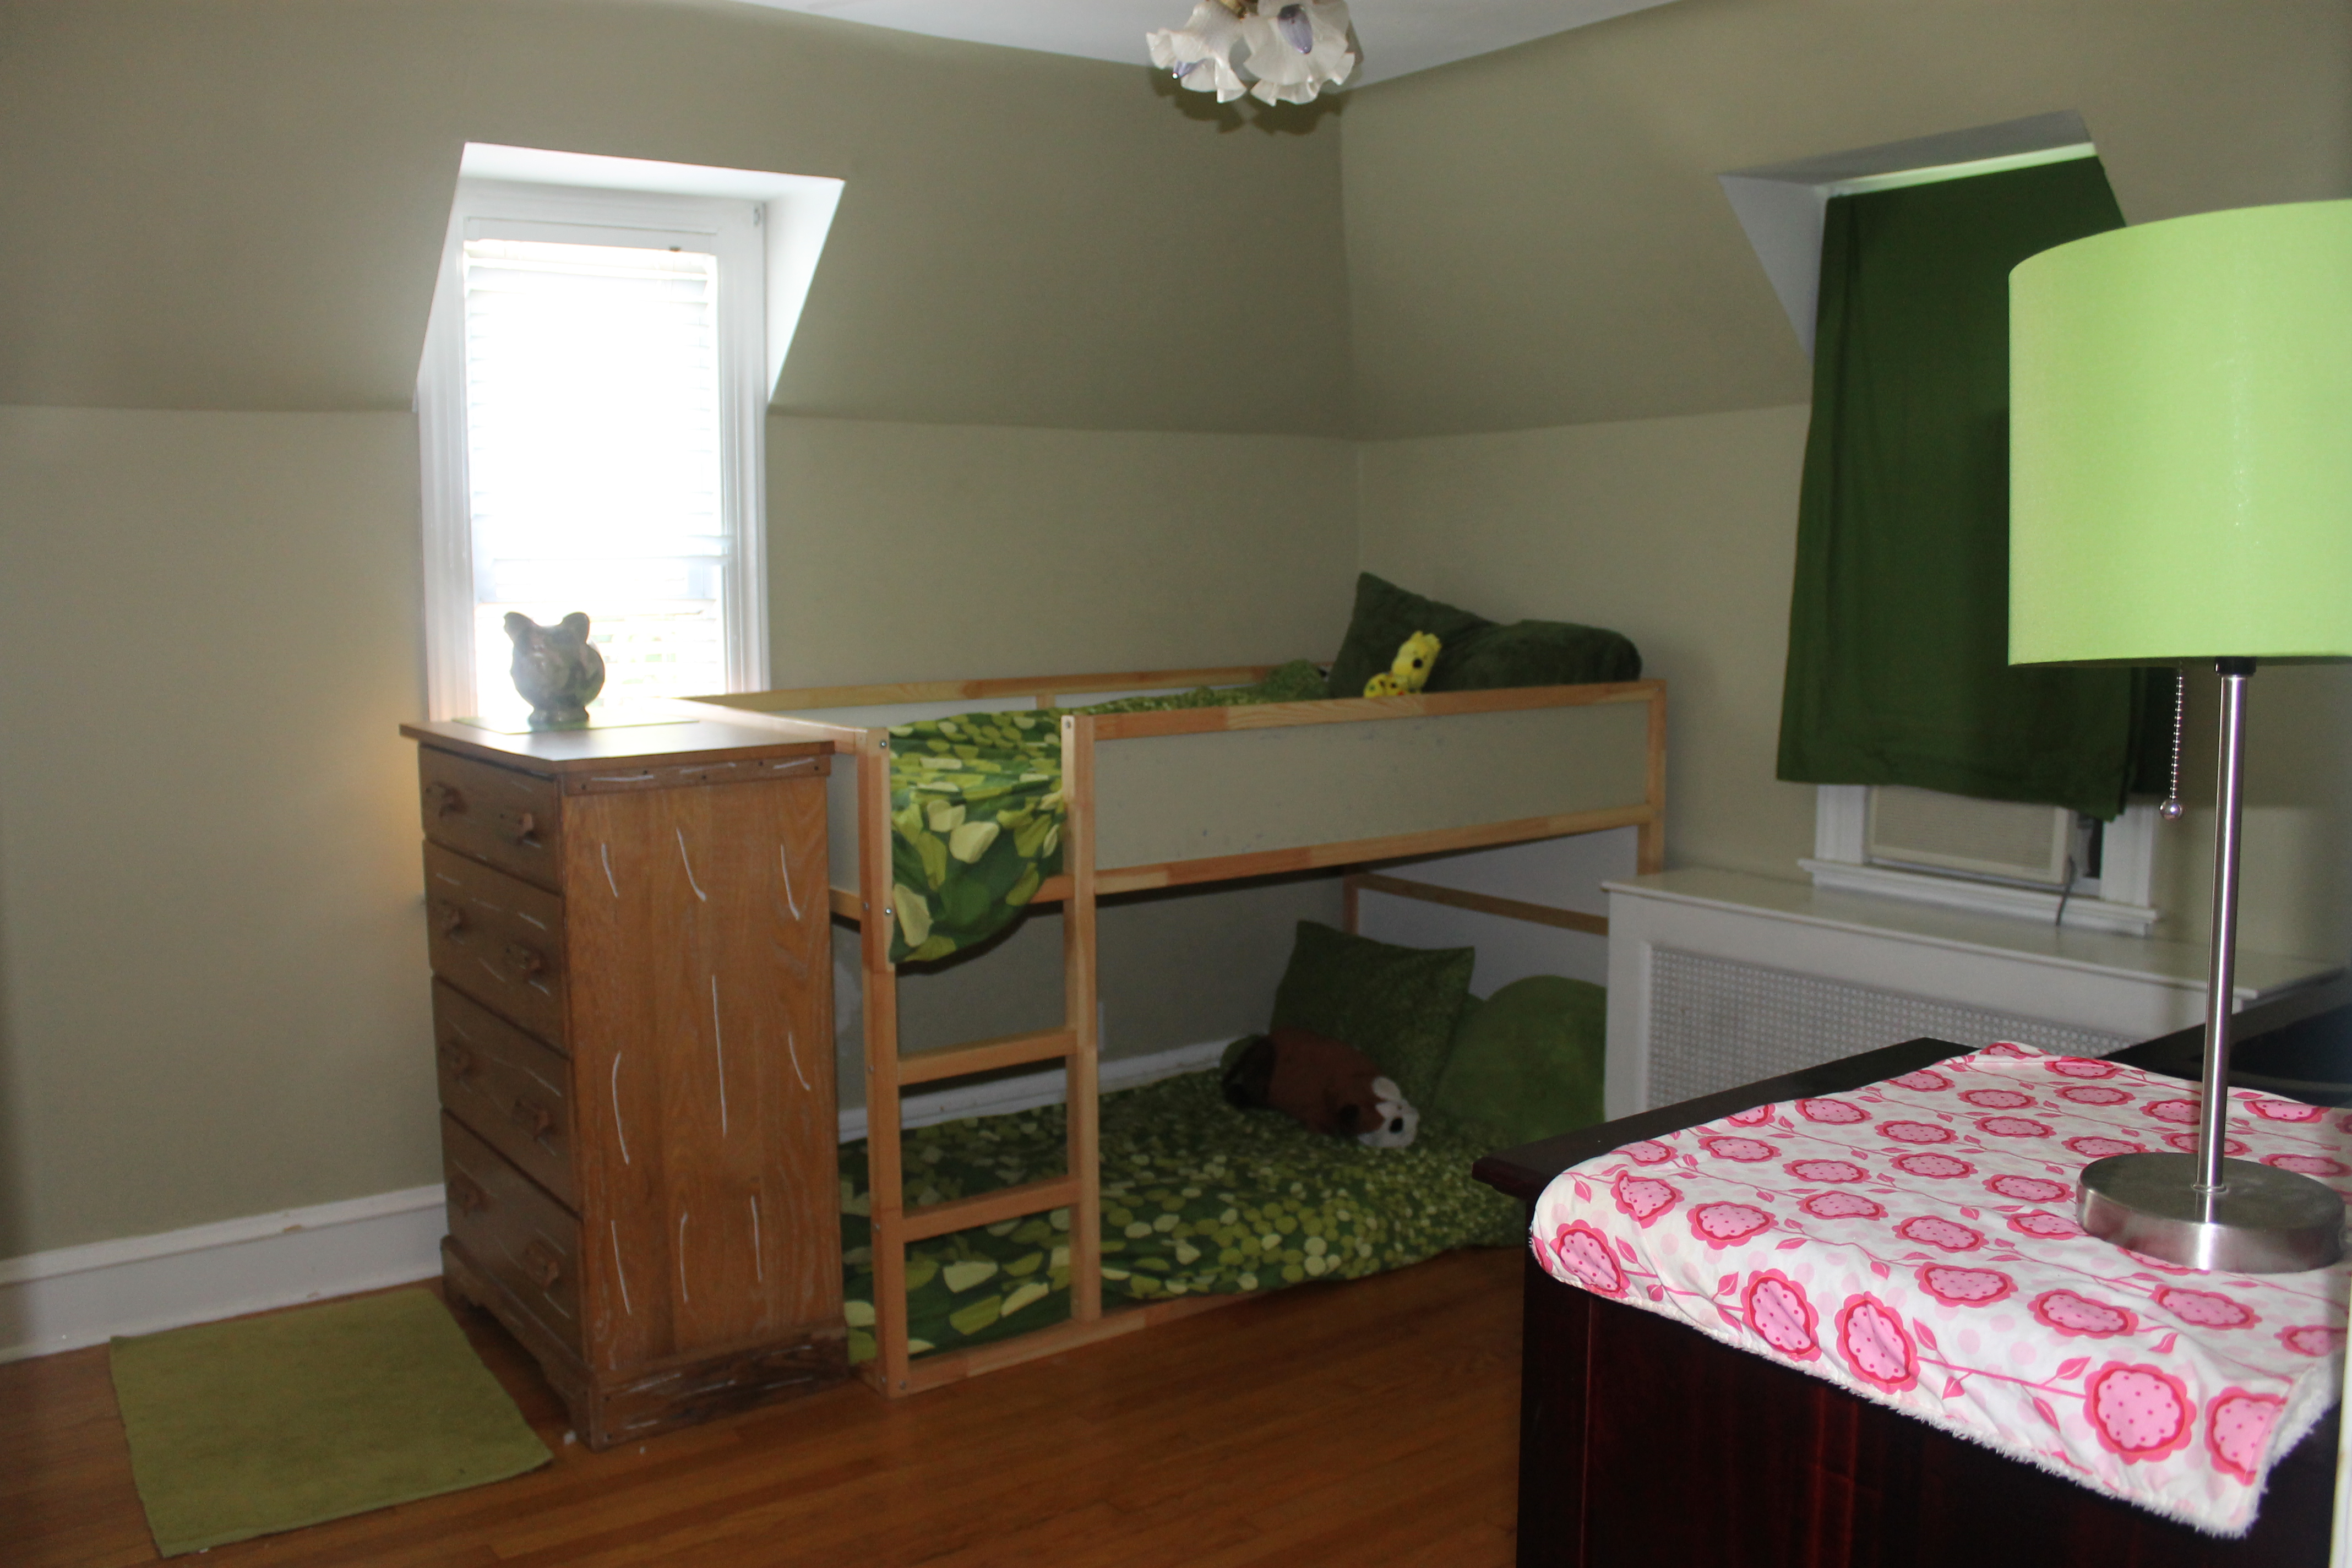 Simple Kids Bedroom small & simple solutions: kids' bedroom. alternate title: a